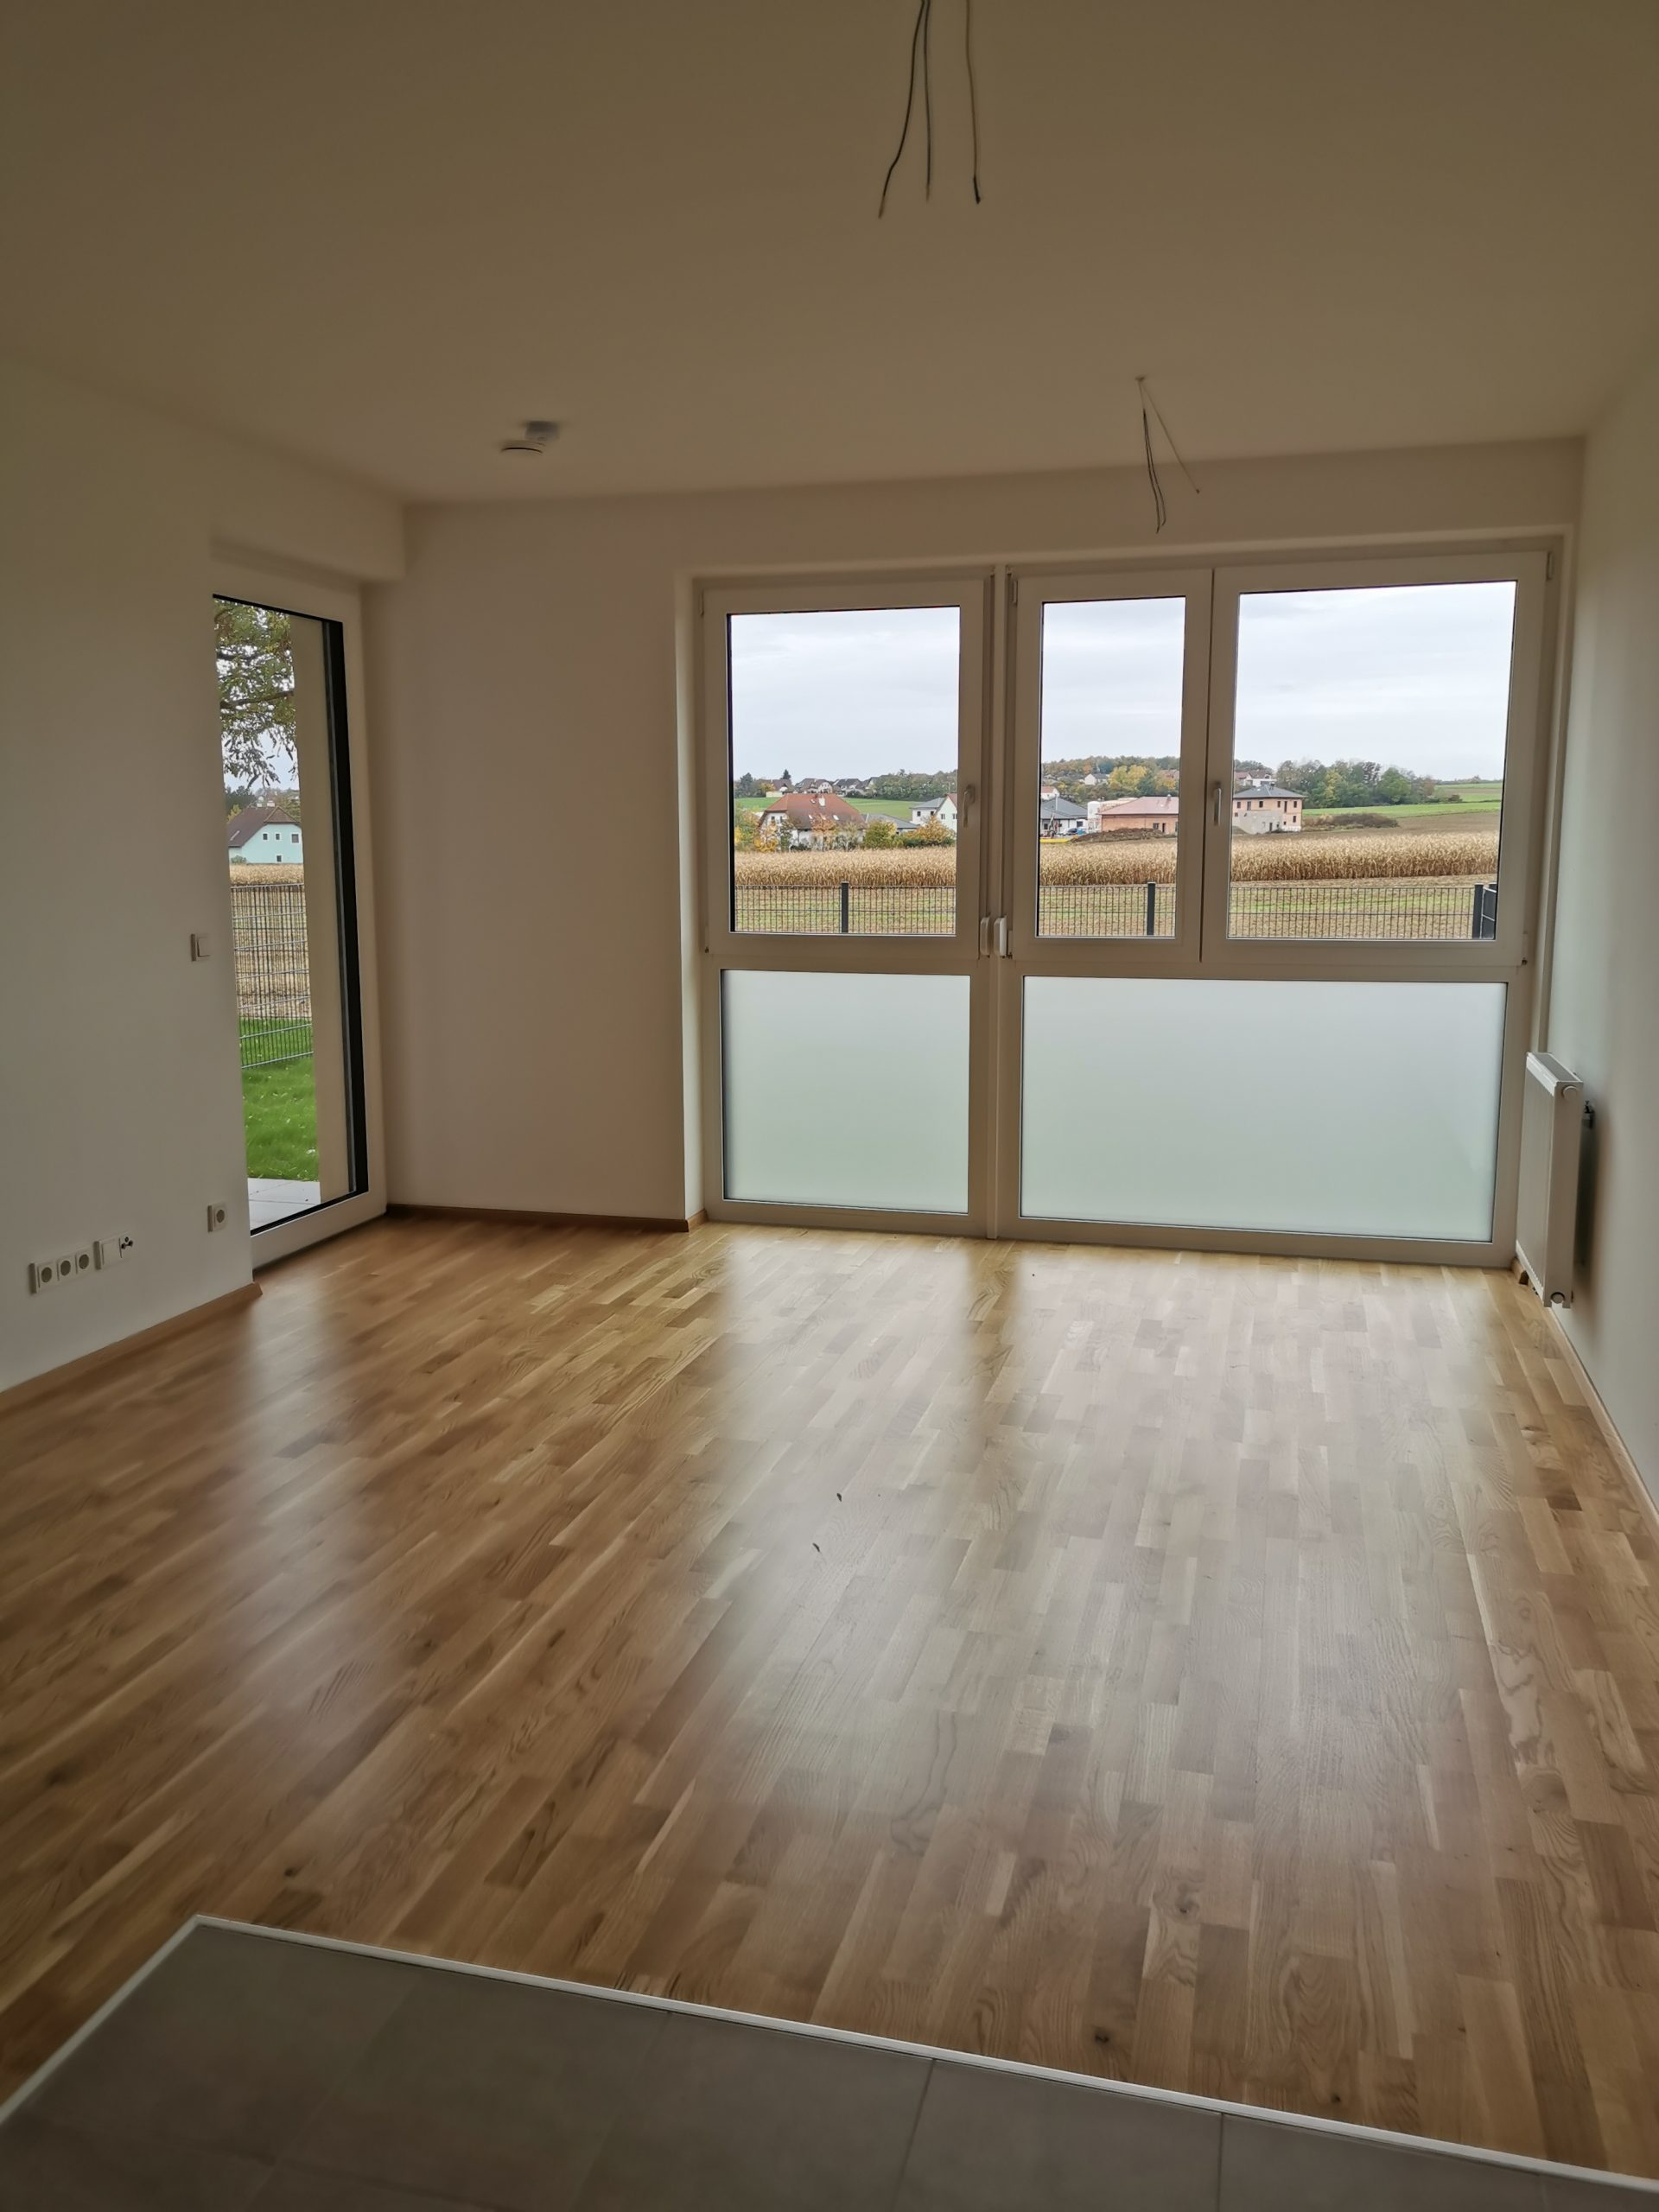 Immobilie von Kamptal in 3730 Eggenburg, Horn, Eggenburg VII - Top 102 #0